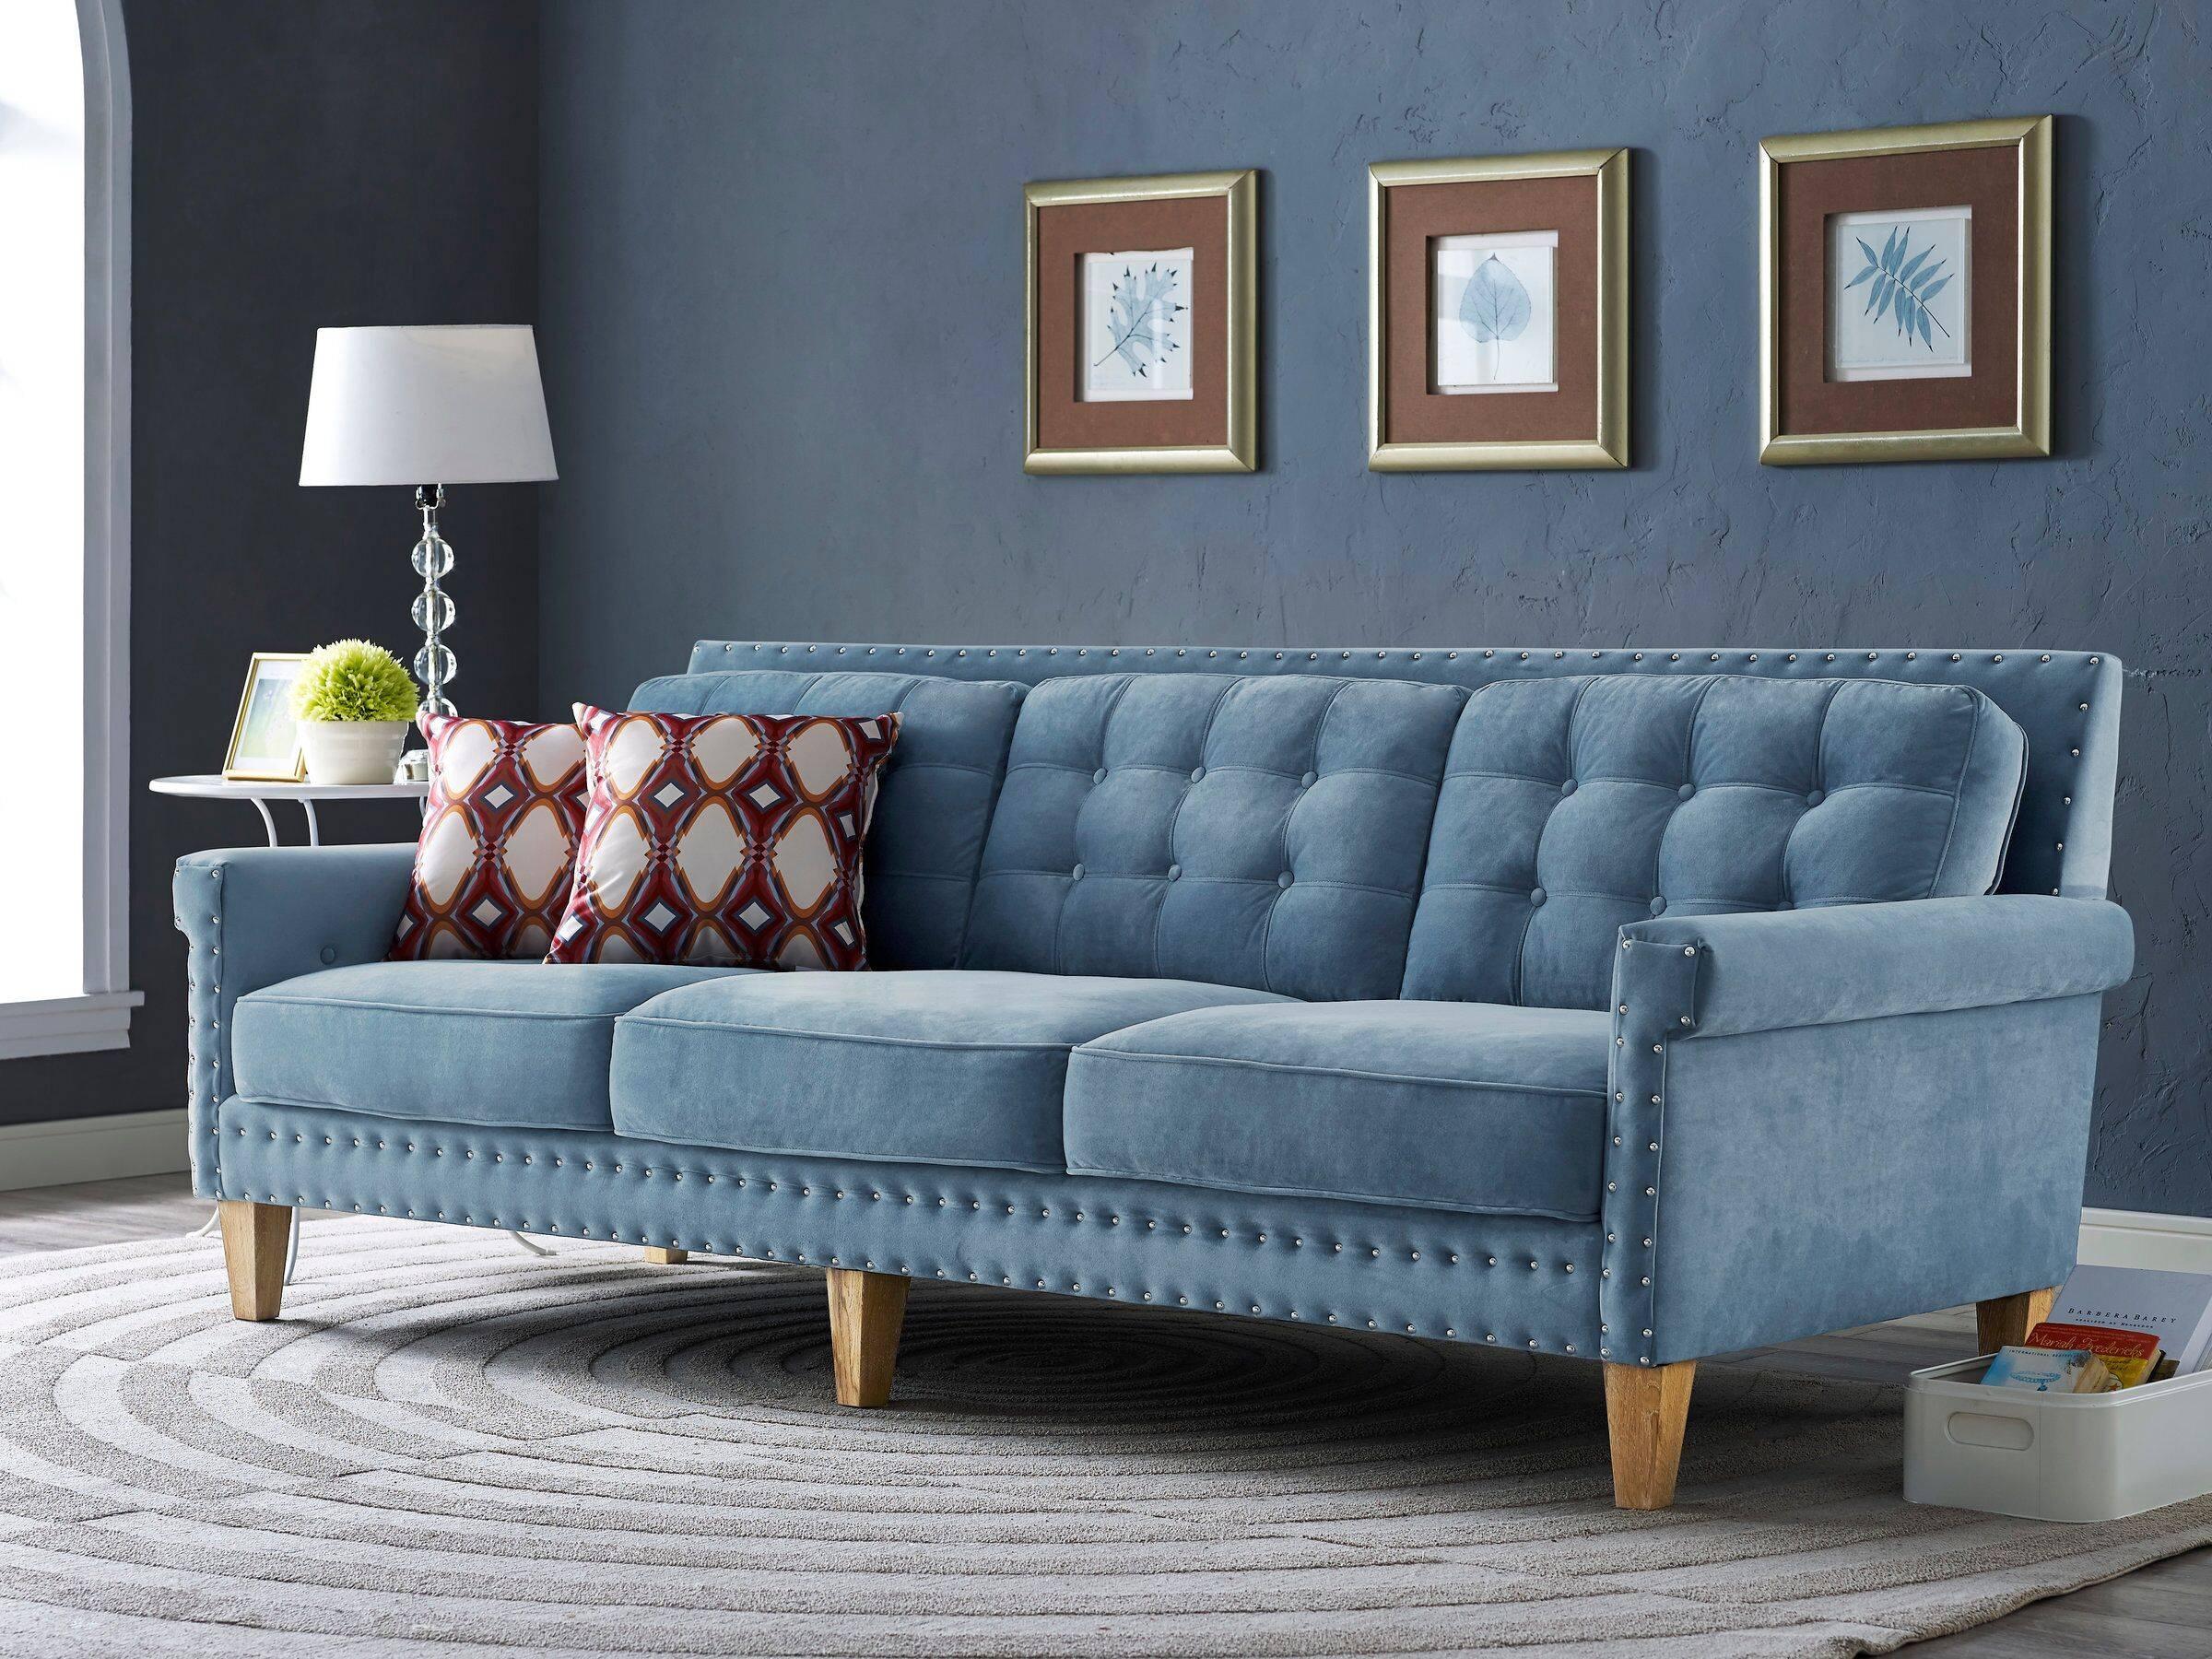 Blue Velvet Tufted Sofa | Tehranmix Decoration for Blue Tufted Sofas (Image 9 of 30)